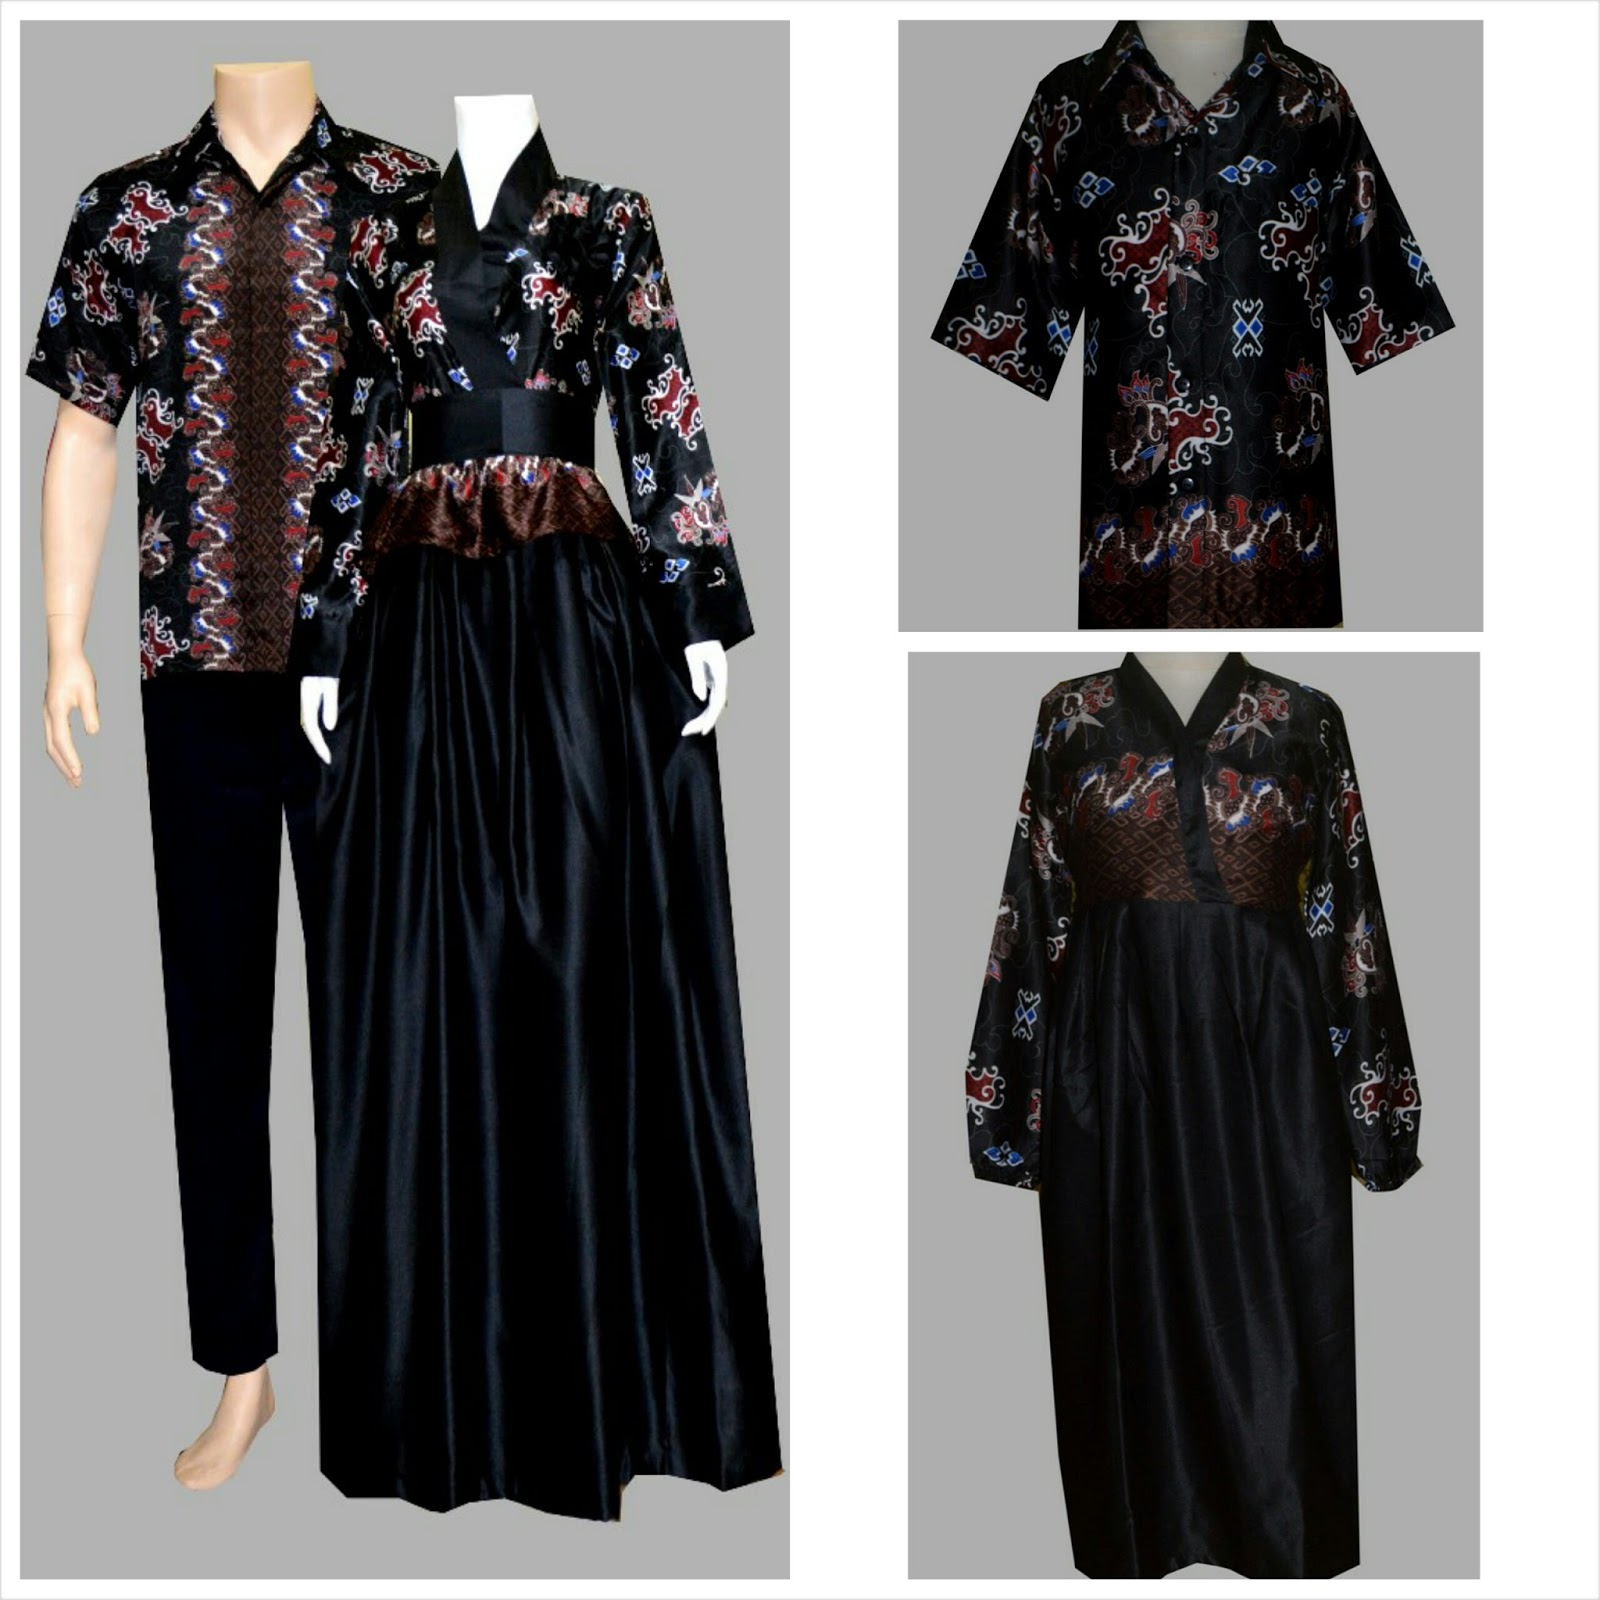 Harga Baju Batik Keluarga Sarimbit Couple Family Gamis Ibu